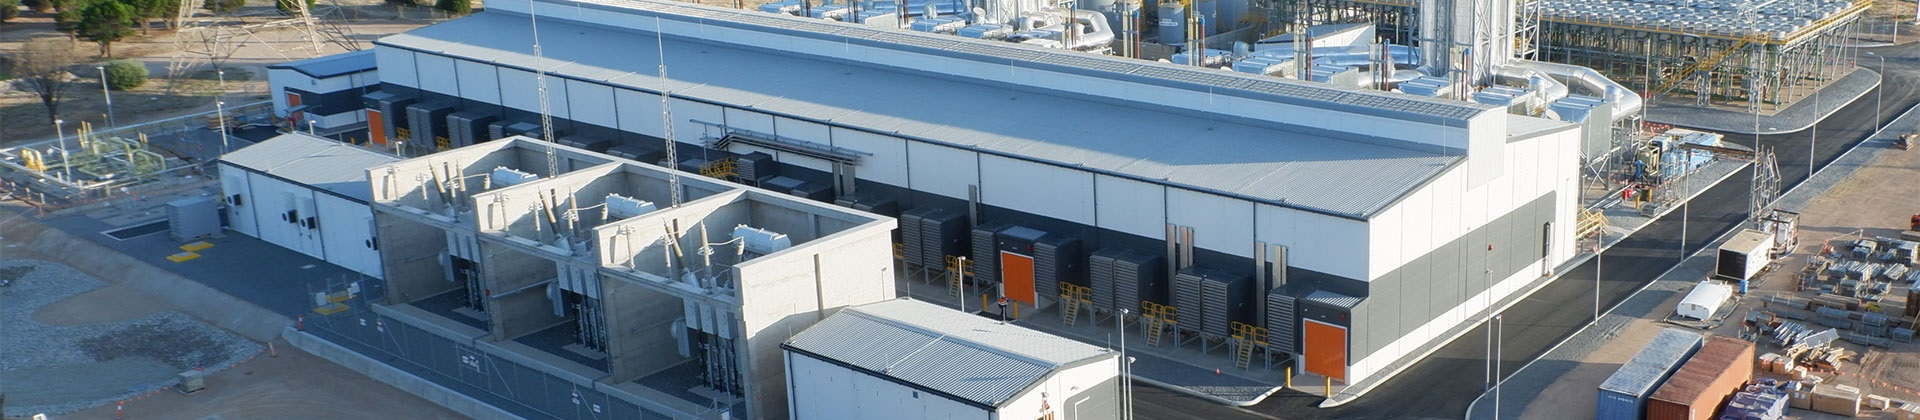 AGL Energy Limited, Australia Barker Inlet Power Station